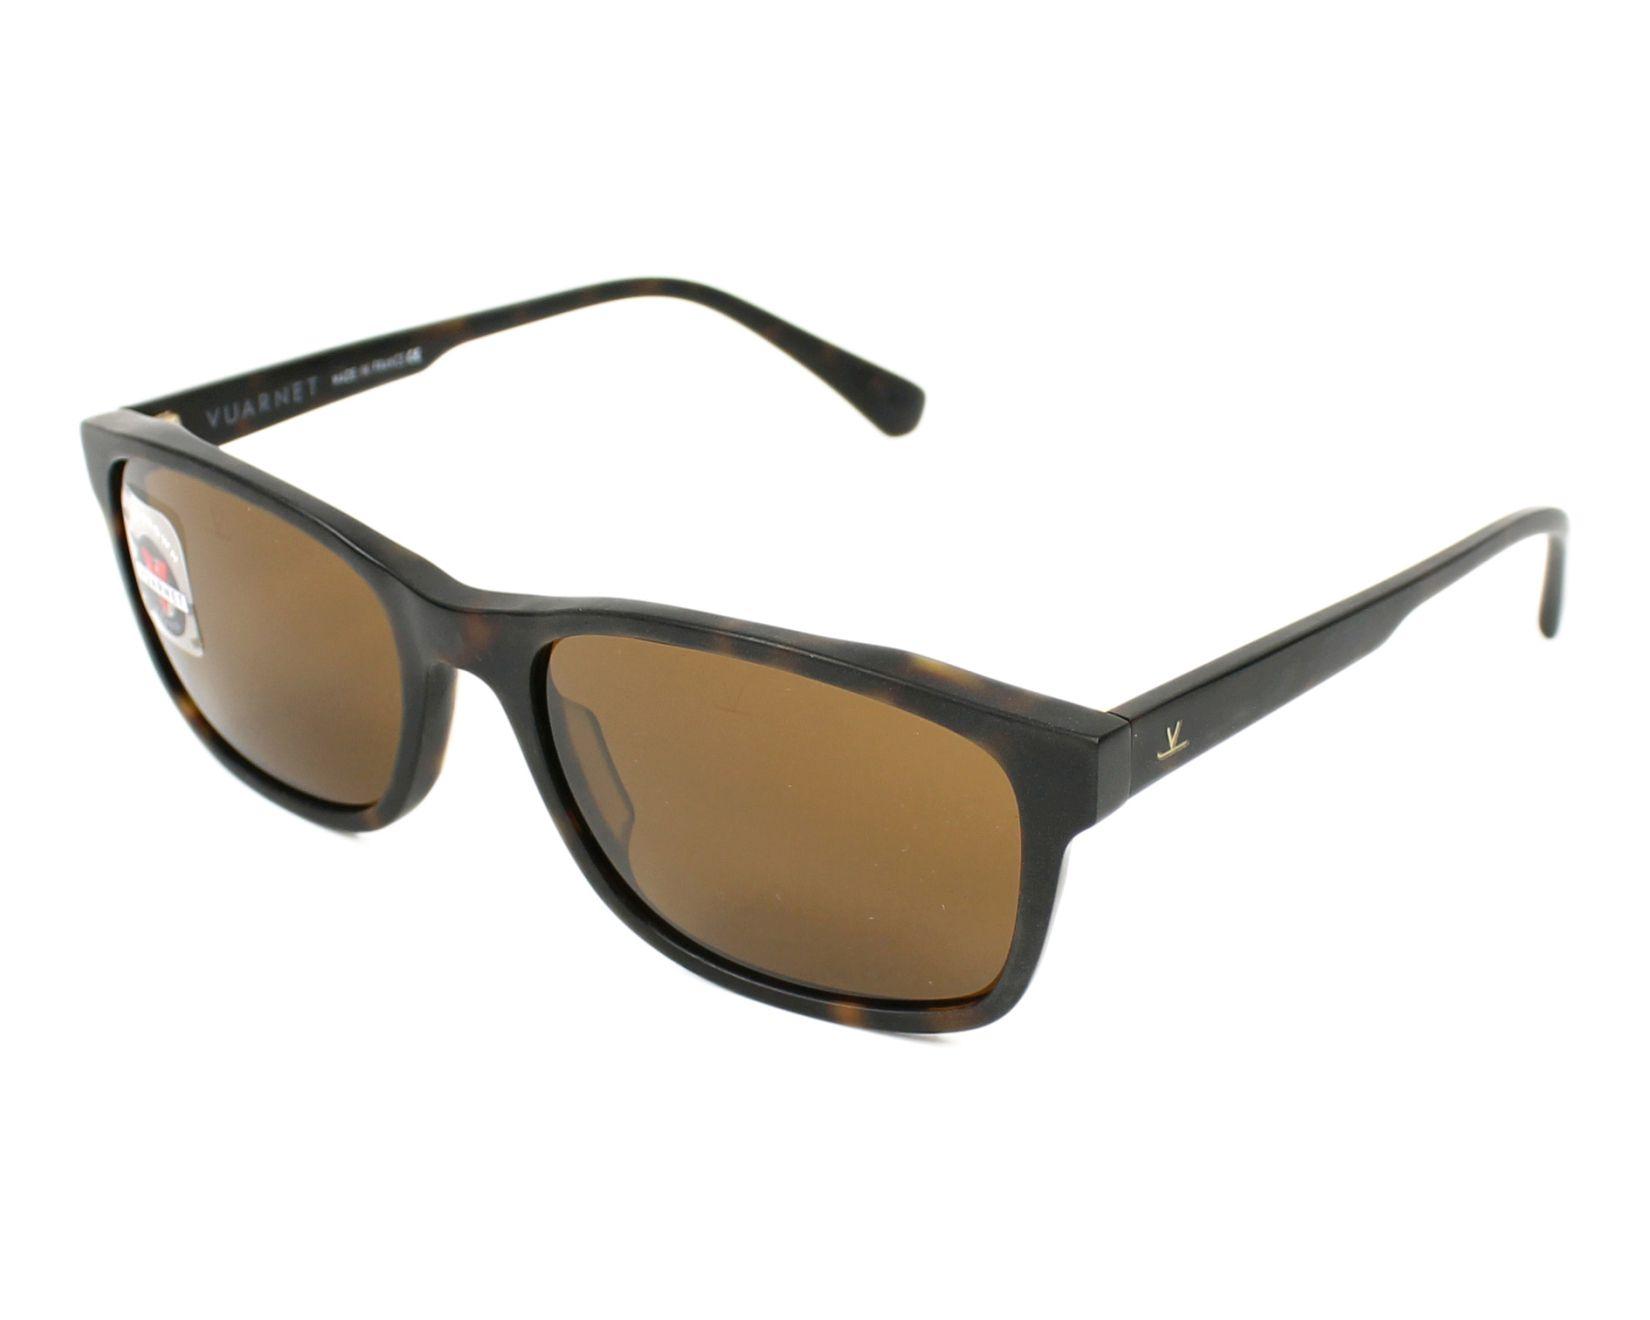 Vuarnet Sunglasses  vuarnet sunglasses vl 1617 0003 54 visionet